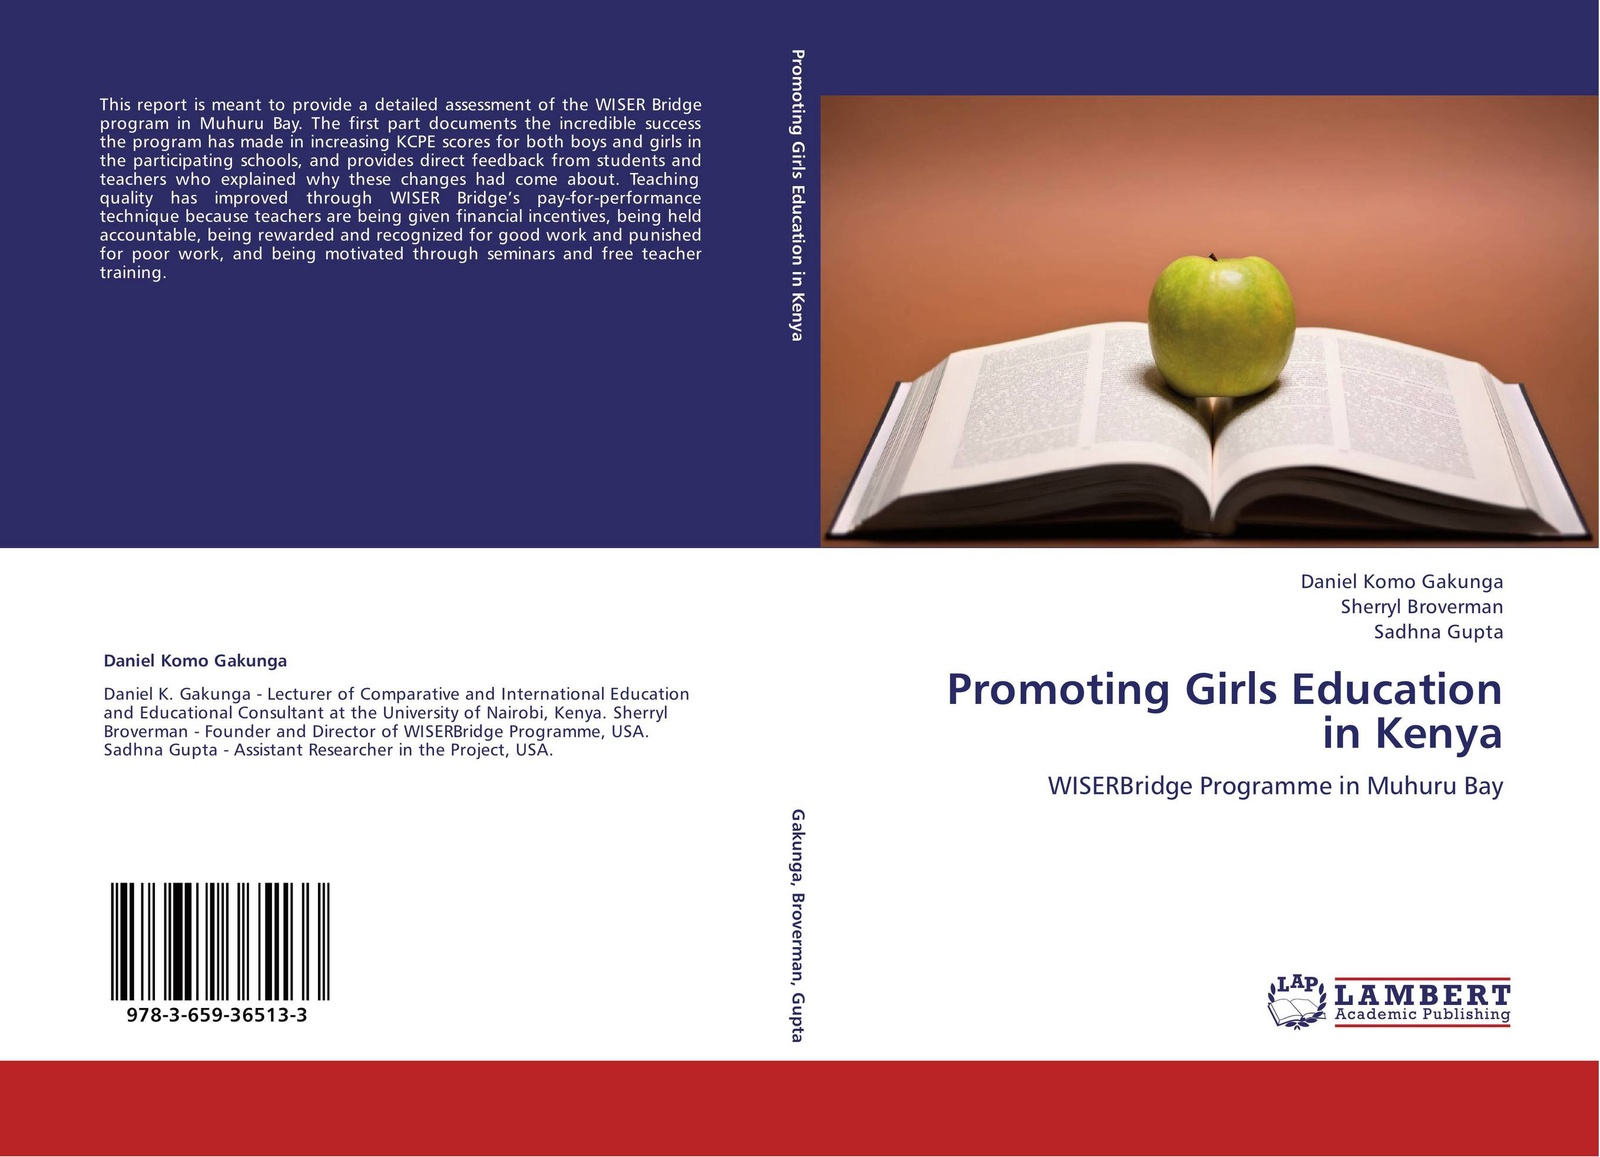 DANIEL KOMO GAKUNGA,Sherryl Broverman and Sadhna Gupta Promoting Girls Education in Kenya karanja david gakunga daniel komo teachers efficacy in the implementation of inclusive education